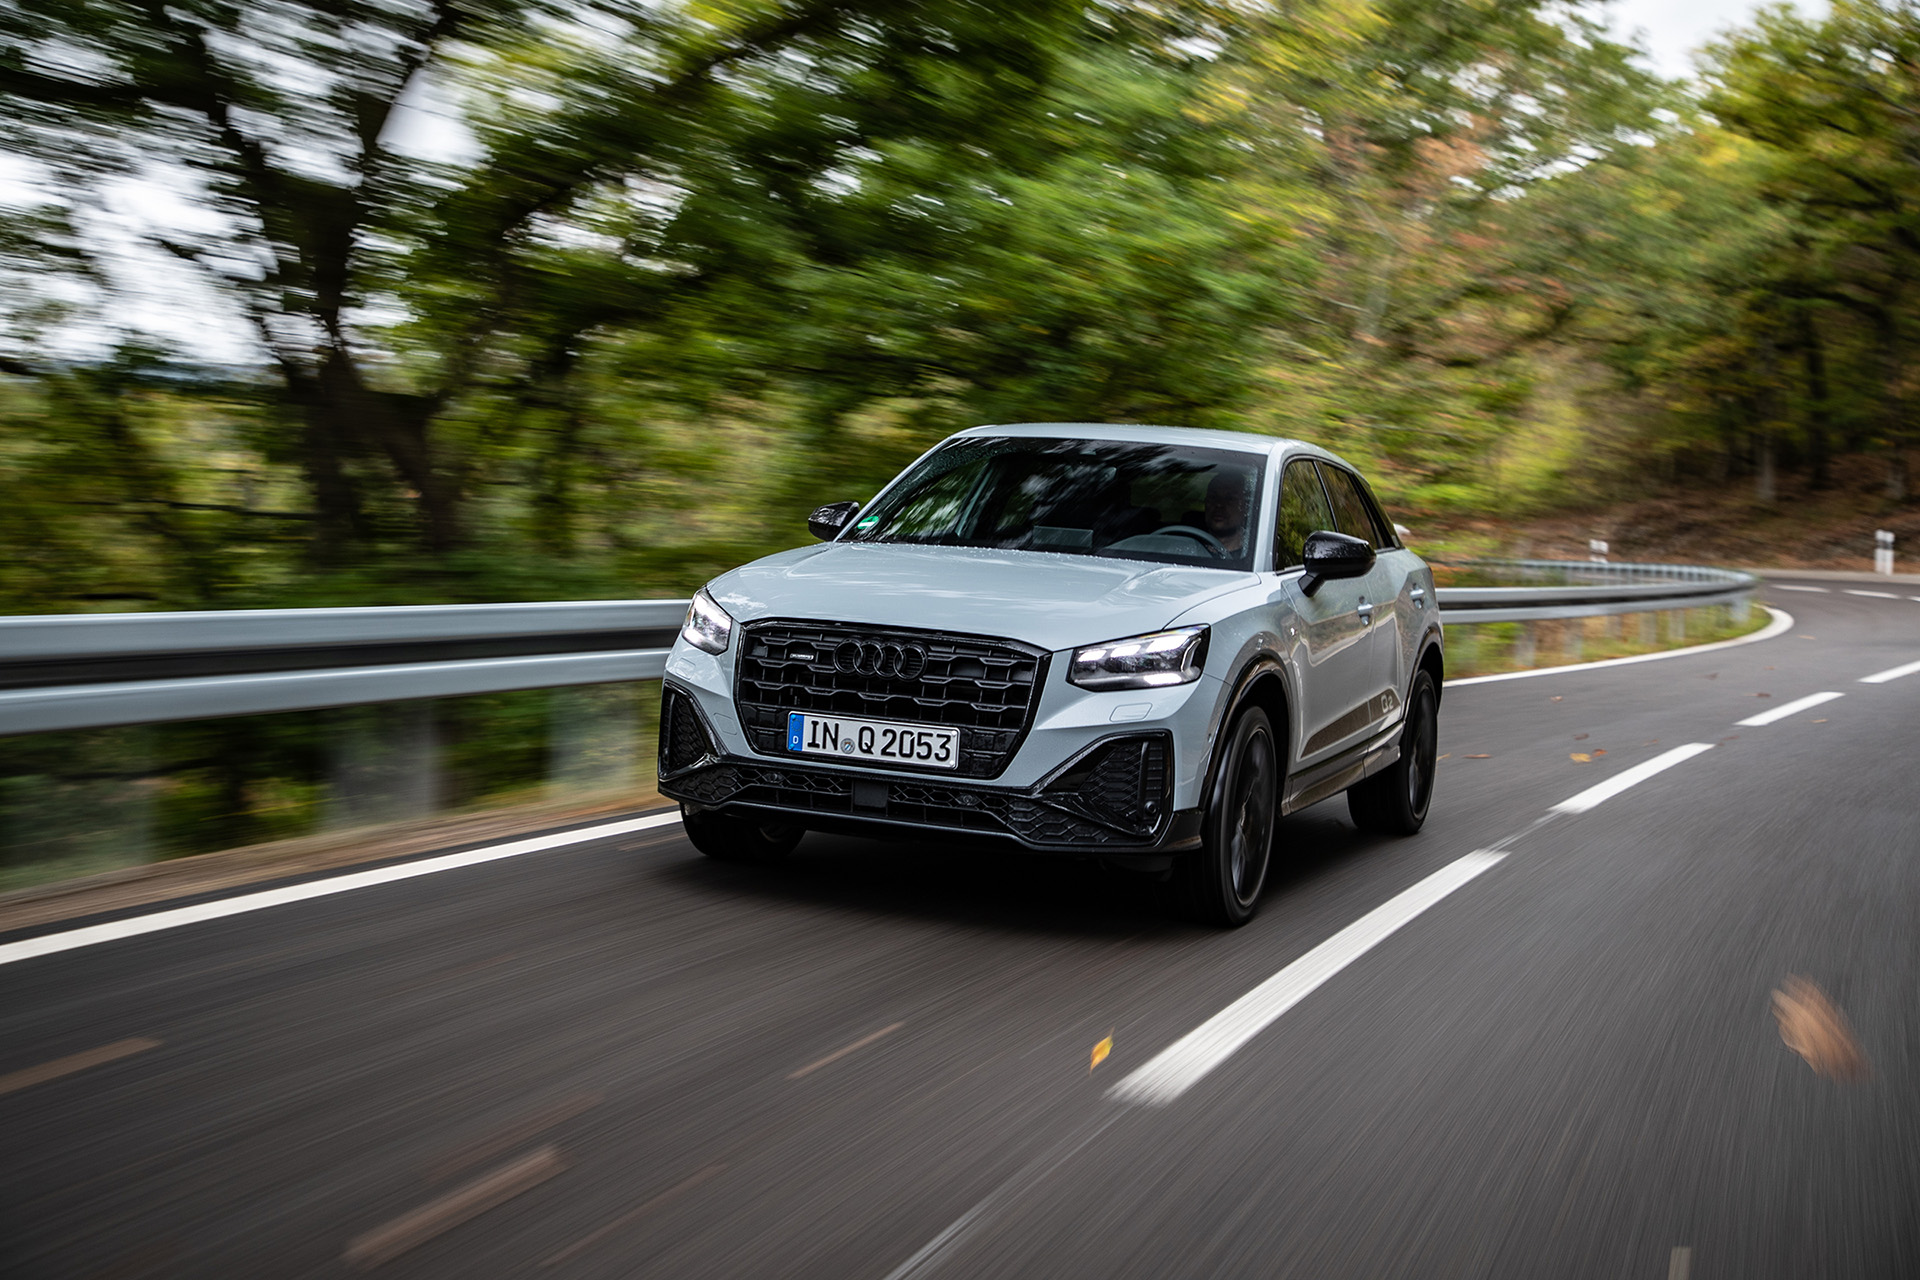 H Audi ξεπέρασε το φράγμα του μισού εκατομμυρίου αυτοκινήτων σε ένα τρίμηνο